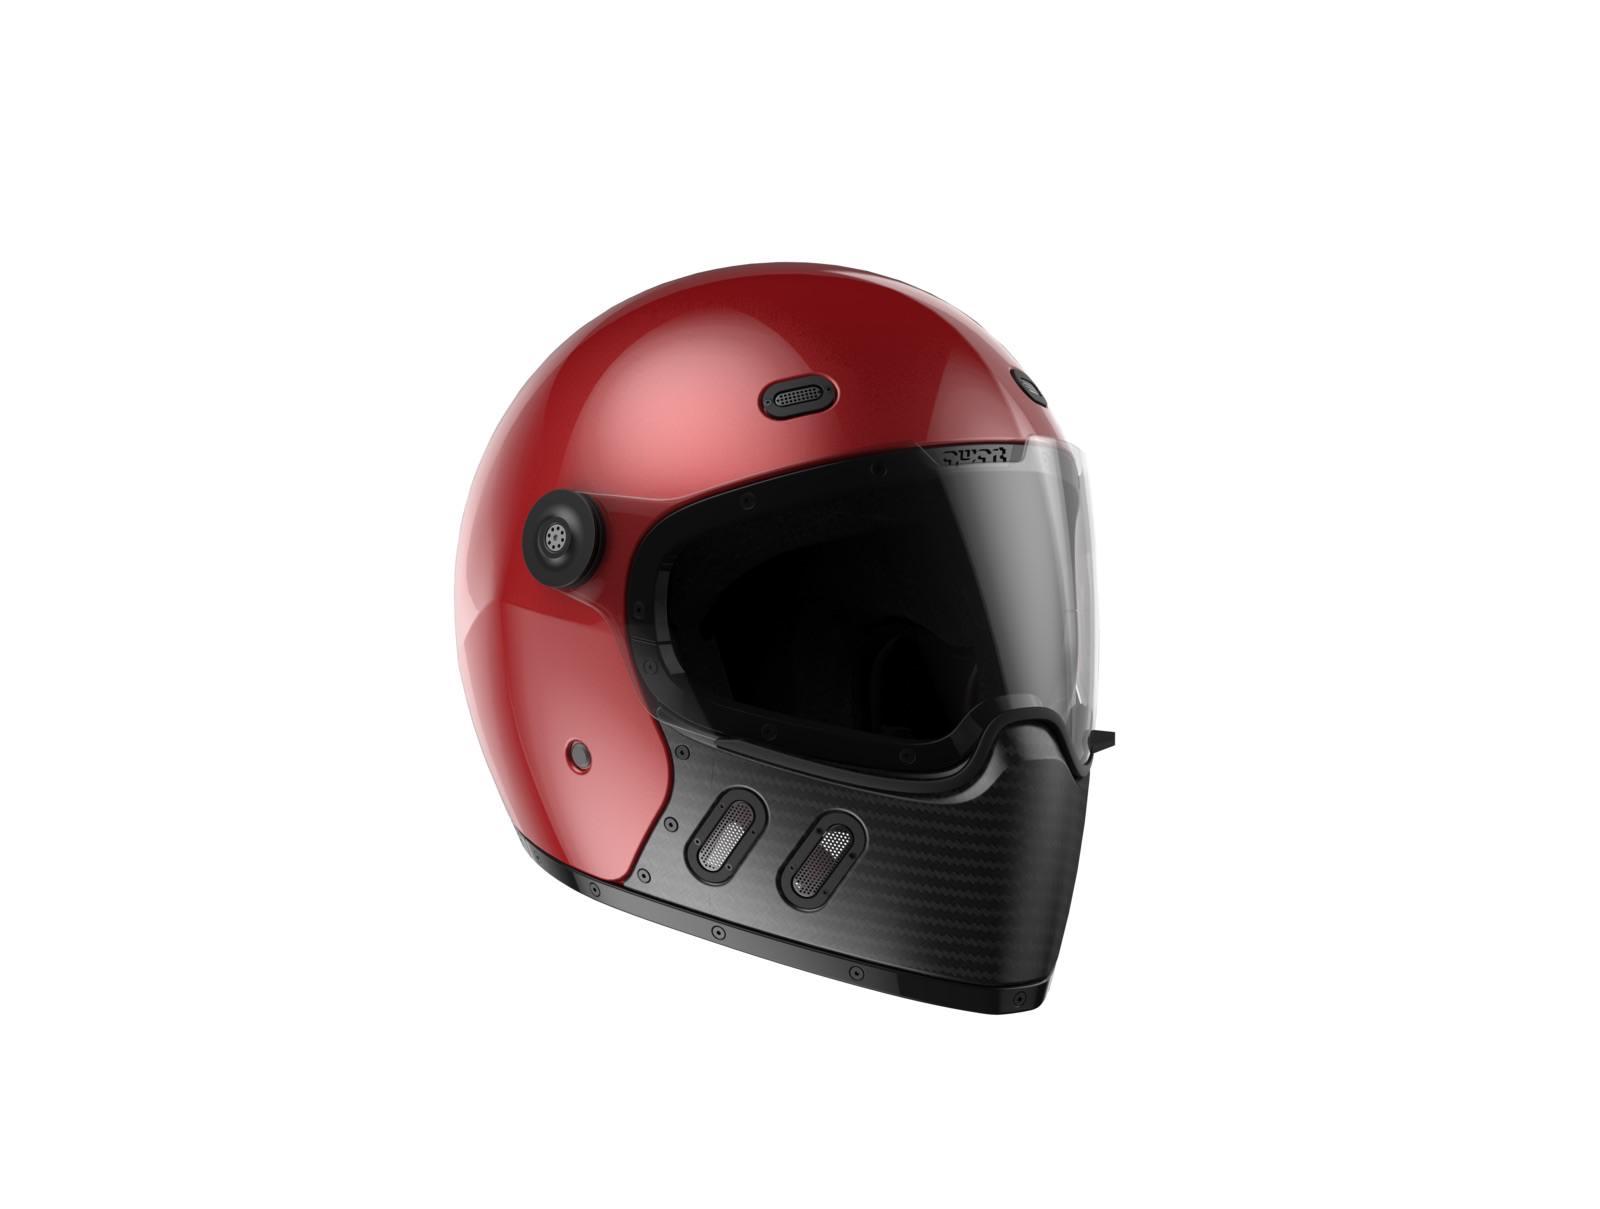 Carbon Fiber Motorcycle Helmets >> Qwart Helmets - The Phoenix: A Modular Carbon Fiber ...